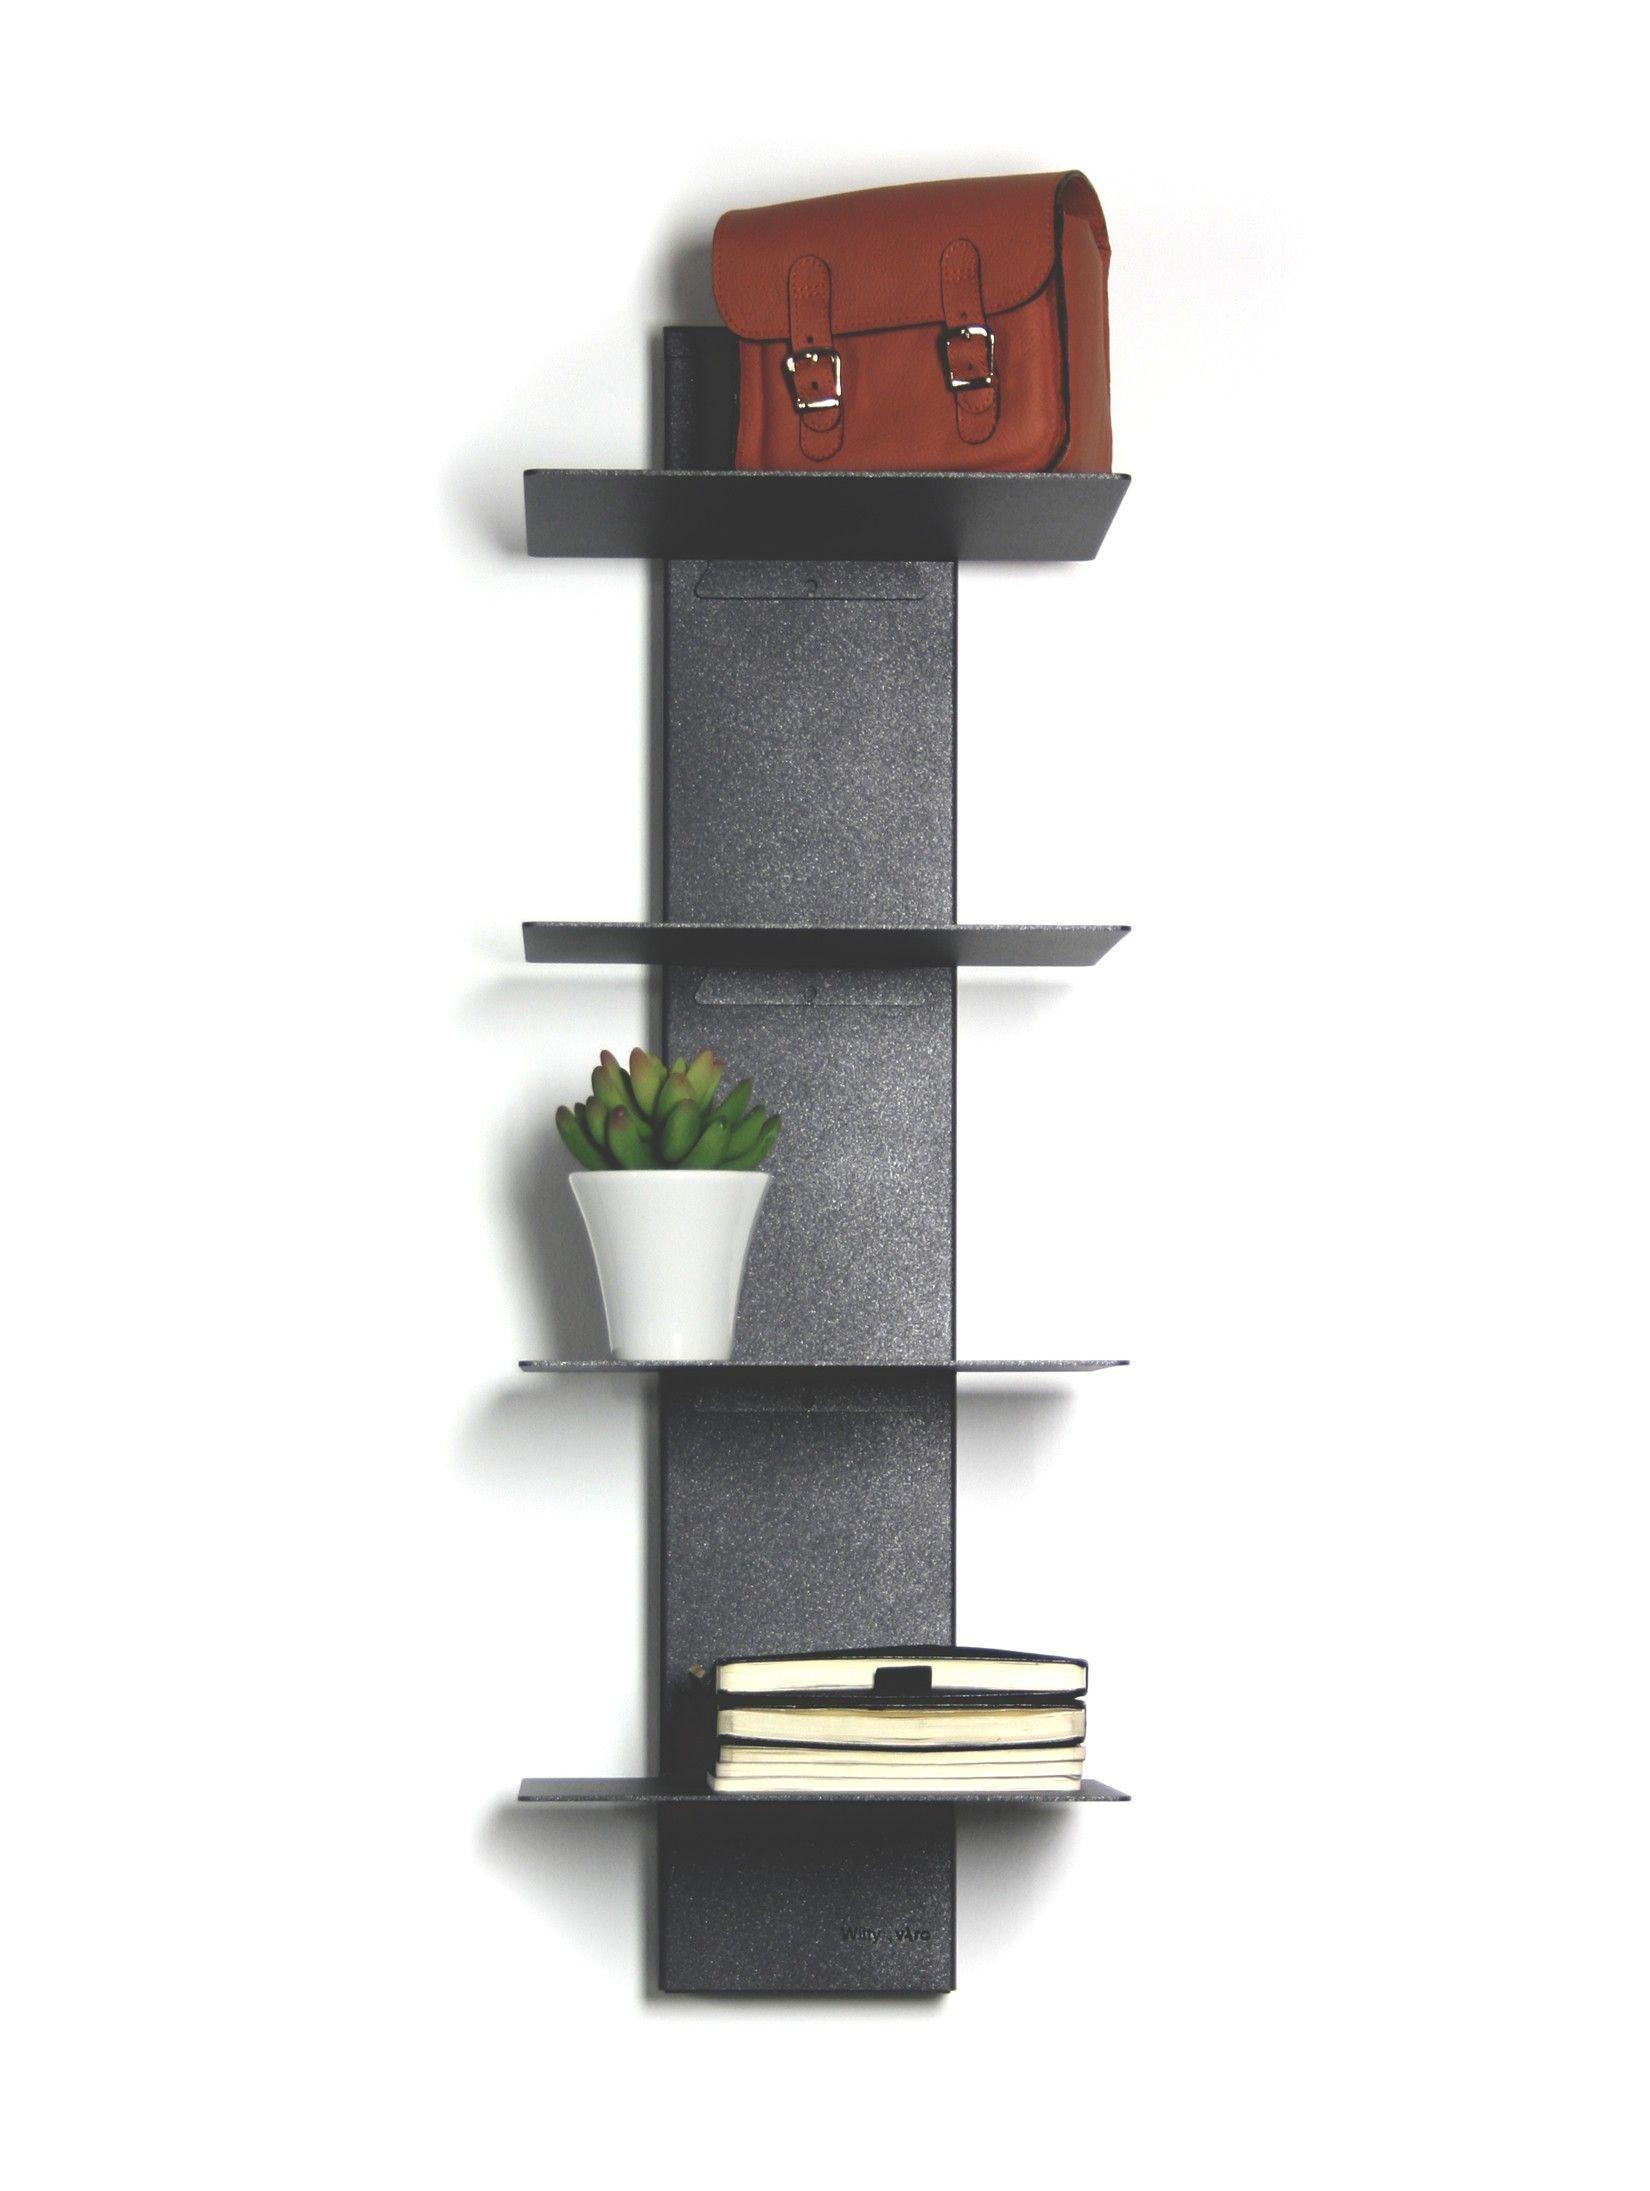 Wandregale Bücherregale jetzt bei desigano com witty wall wandregal desigano aufbewahrung